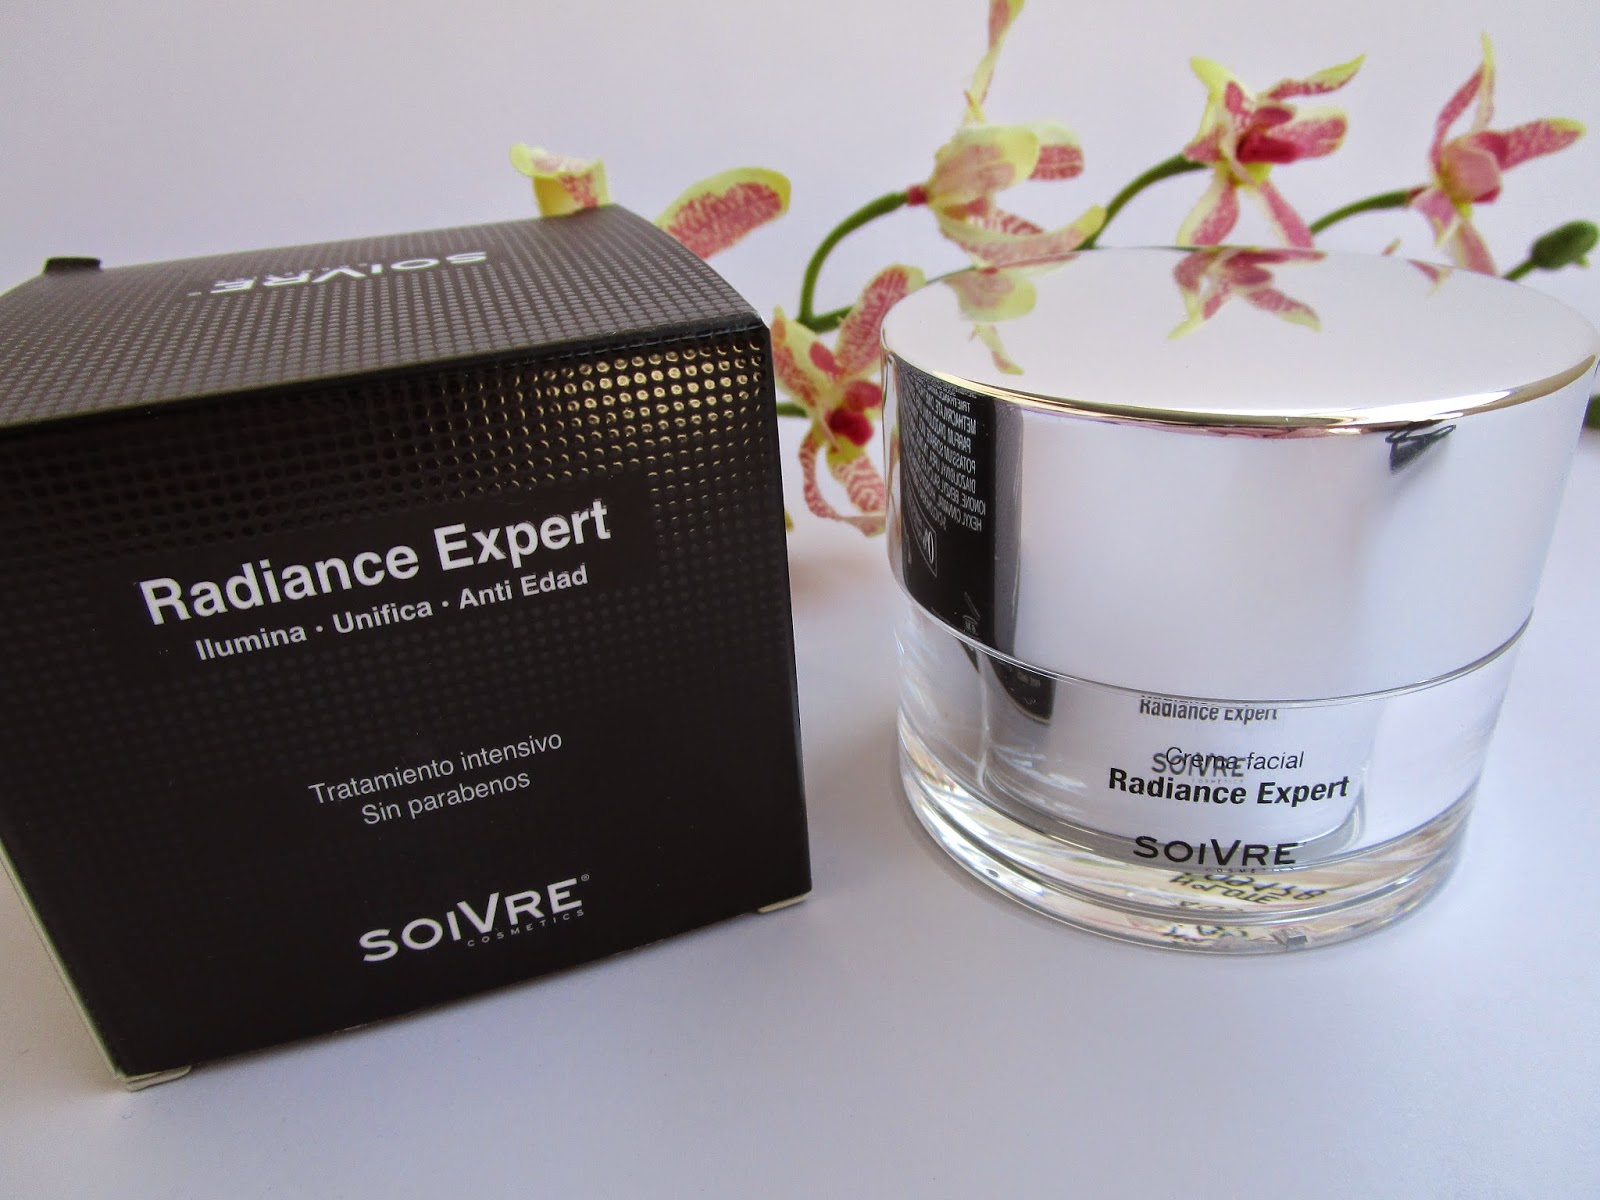 Crema Radiance Expert Soivre Cosmetics